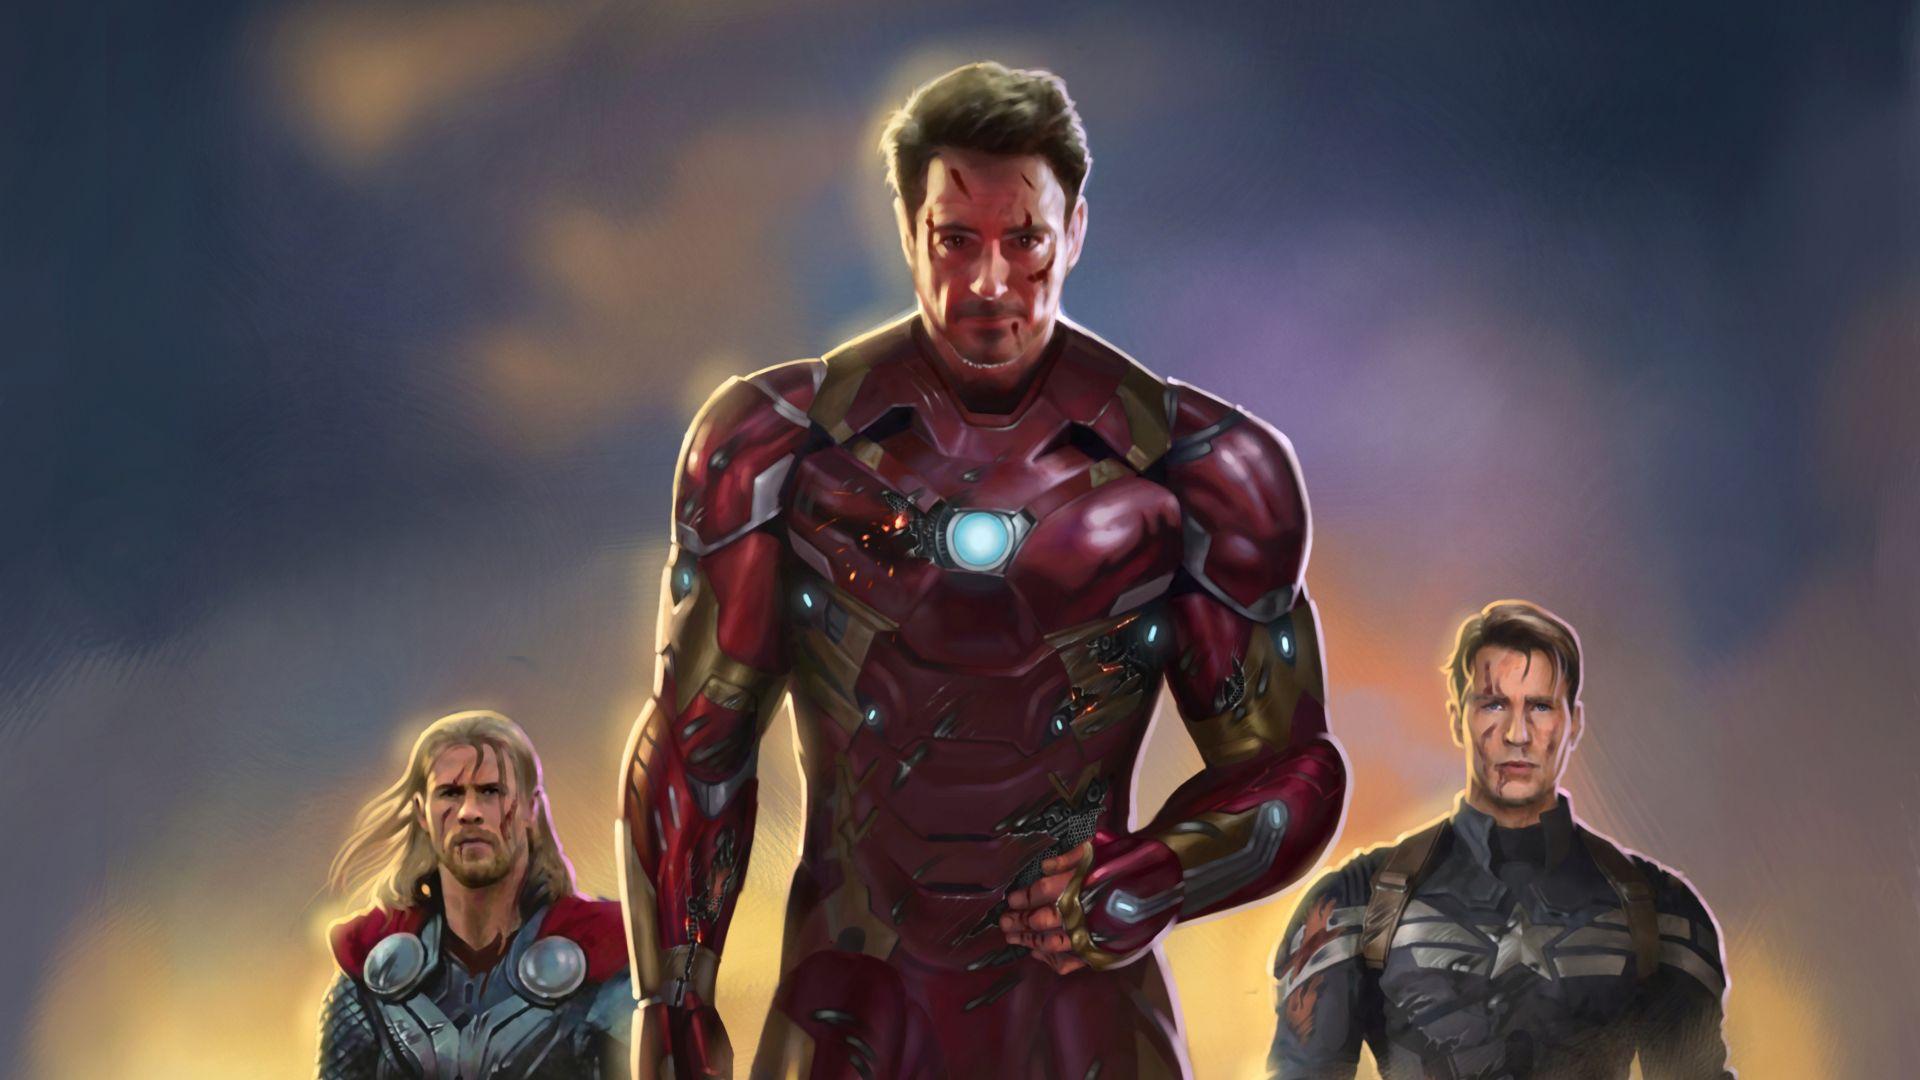 Wallpaper Fan Art 4k Pubattlegrounds: Desktop Wallpaper Iron Man, Captain America, Thor, Fan Art